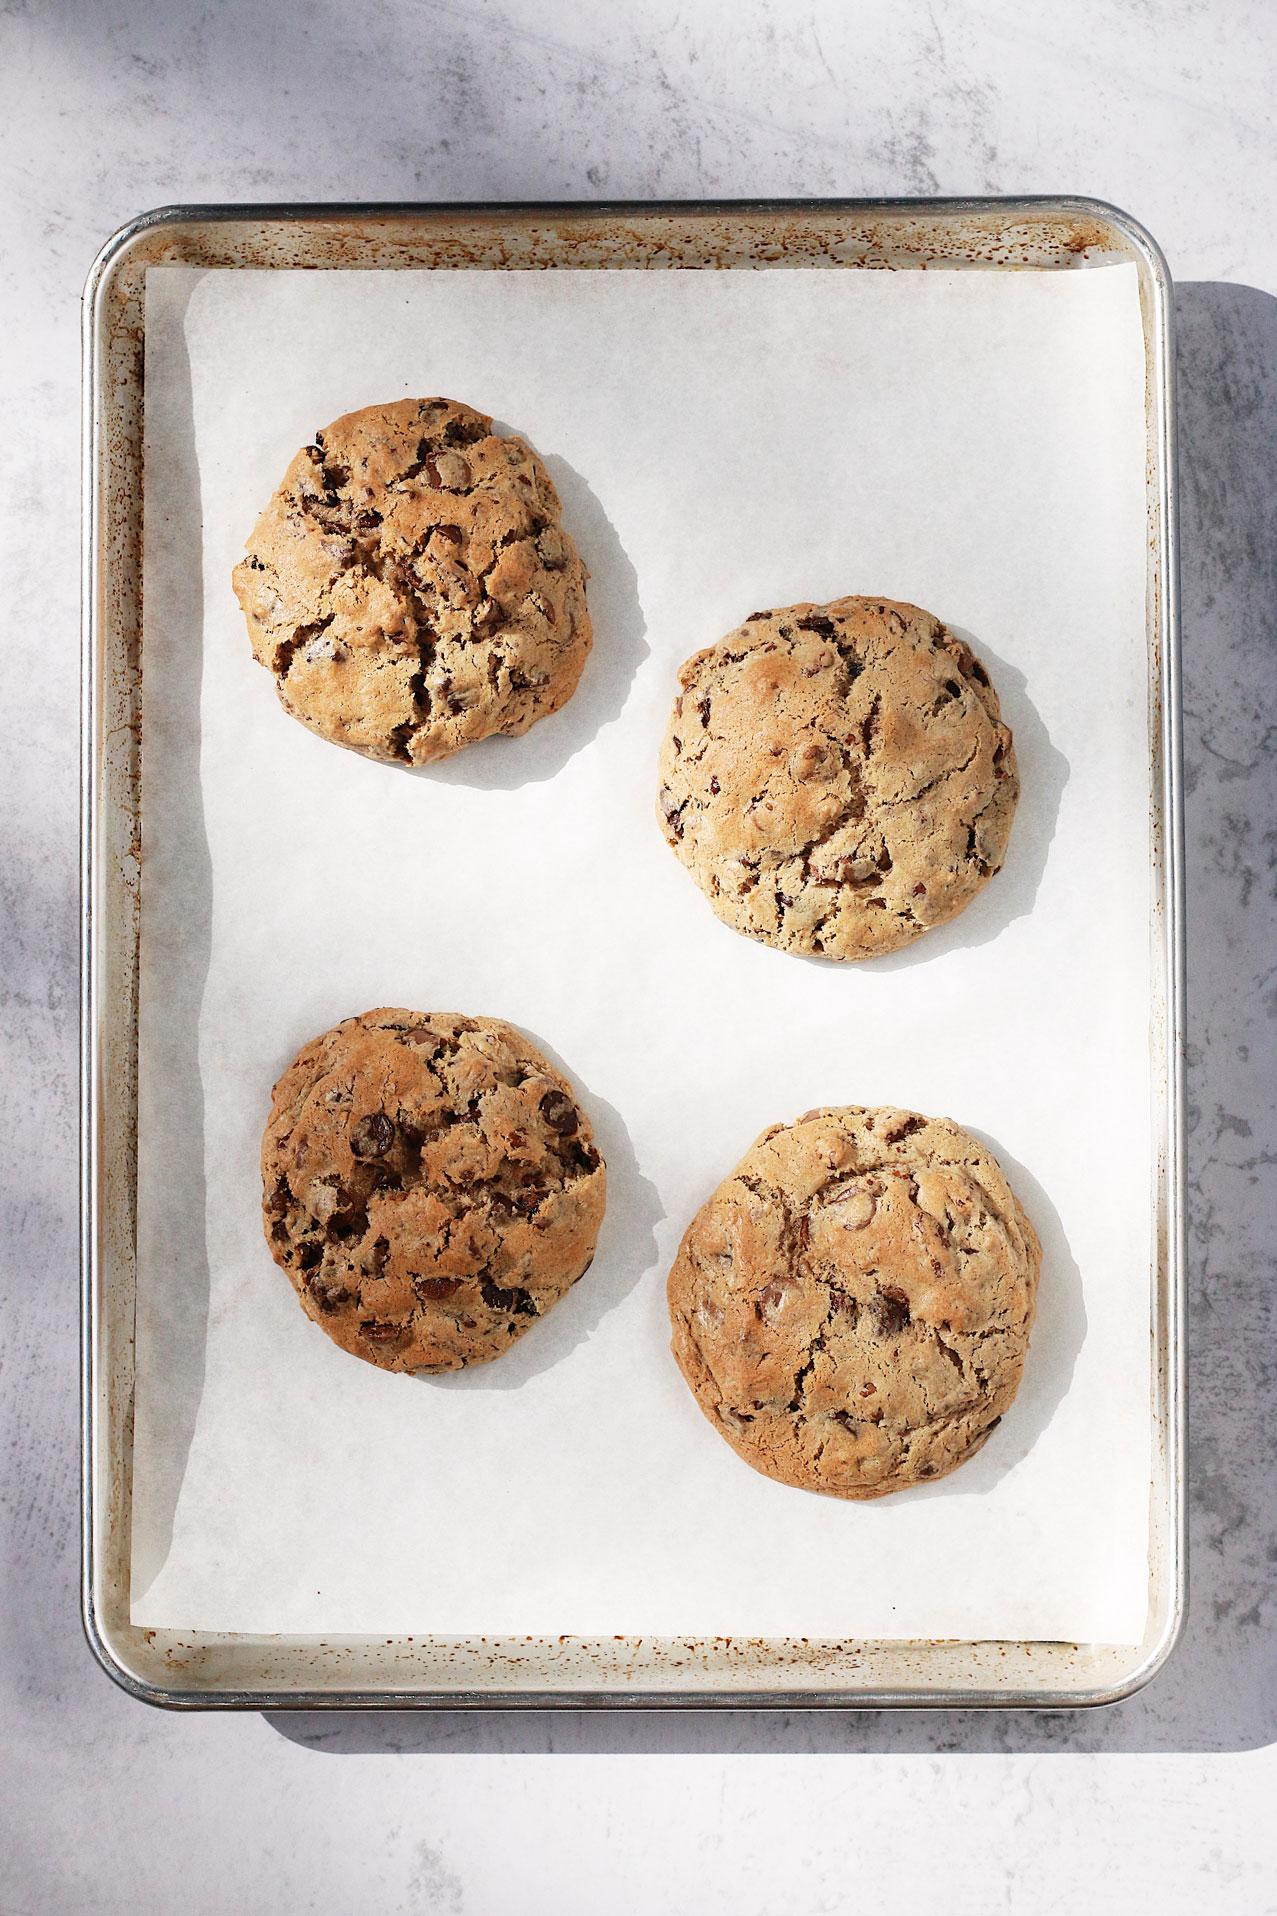 herbakinglab-best-chocolate-chip-cookie-bake-off-stella-park-levain-style-tray